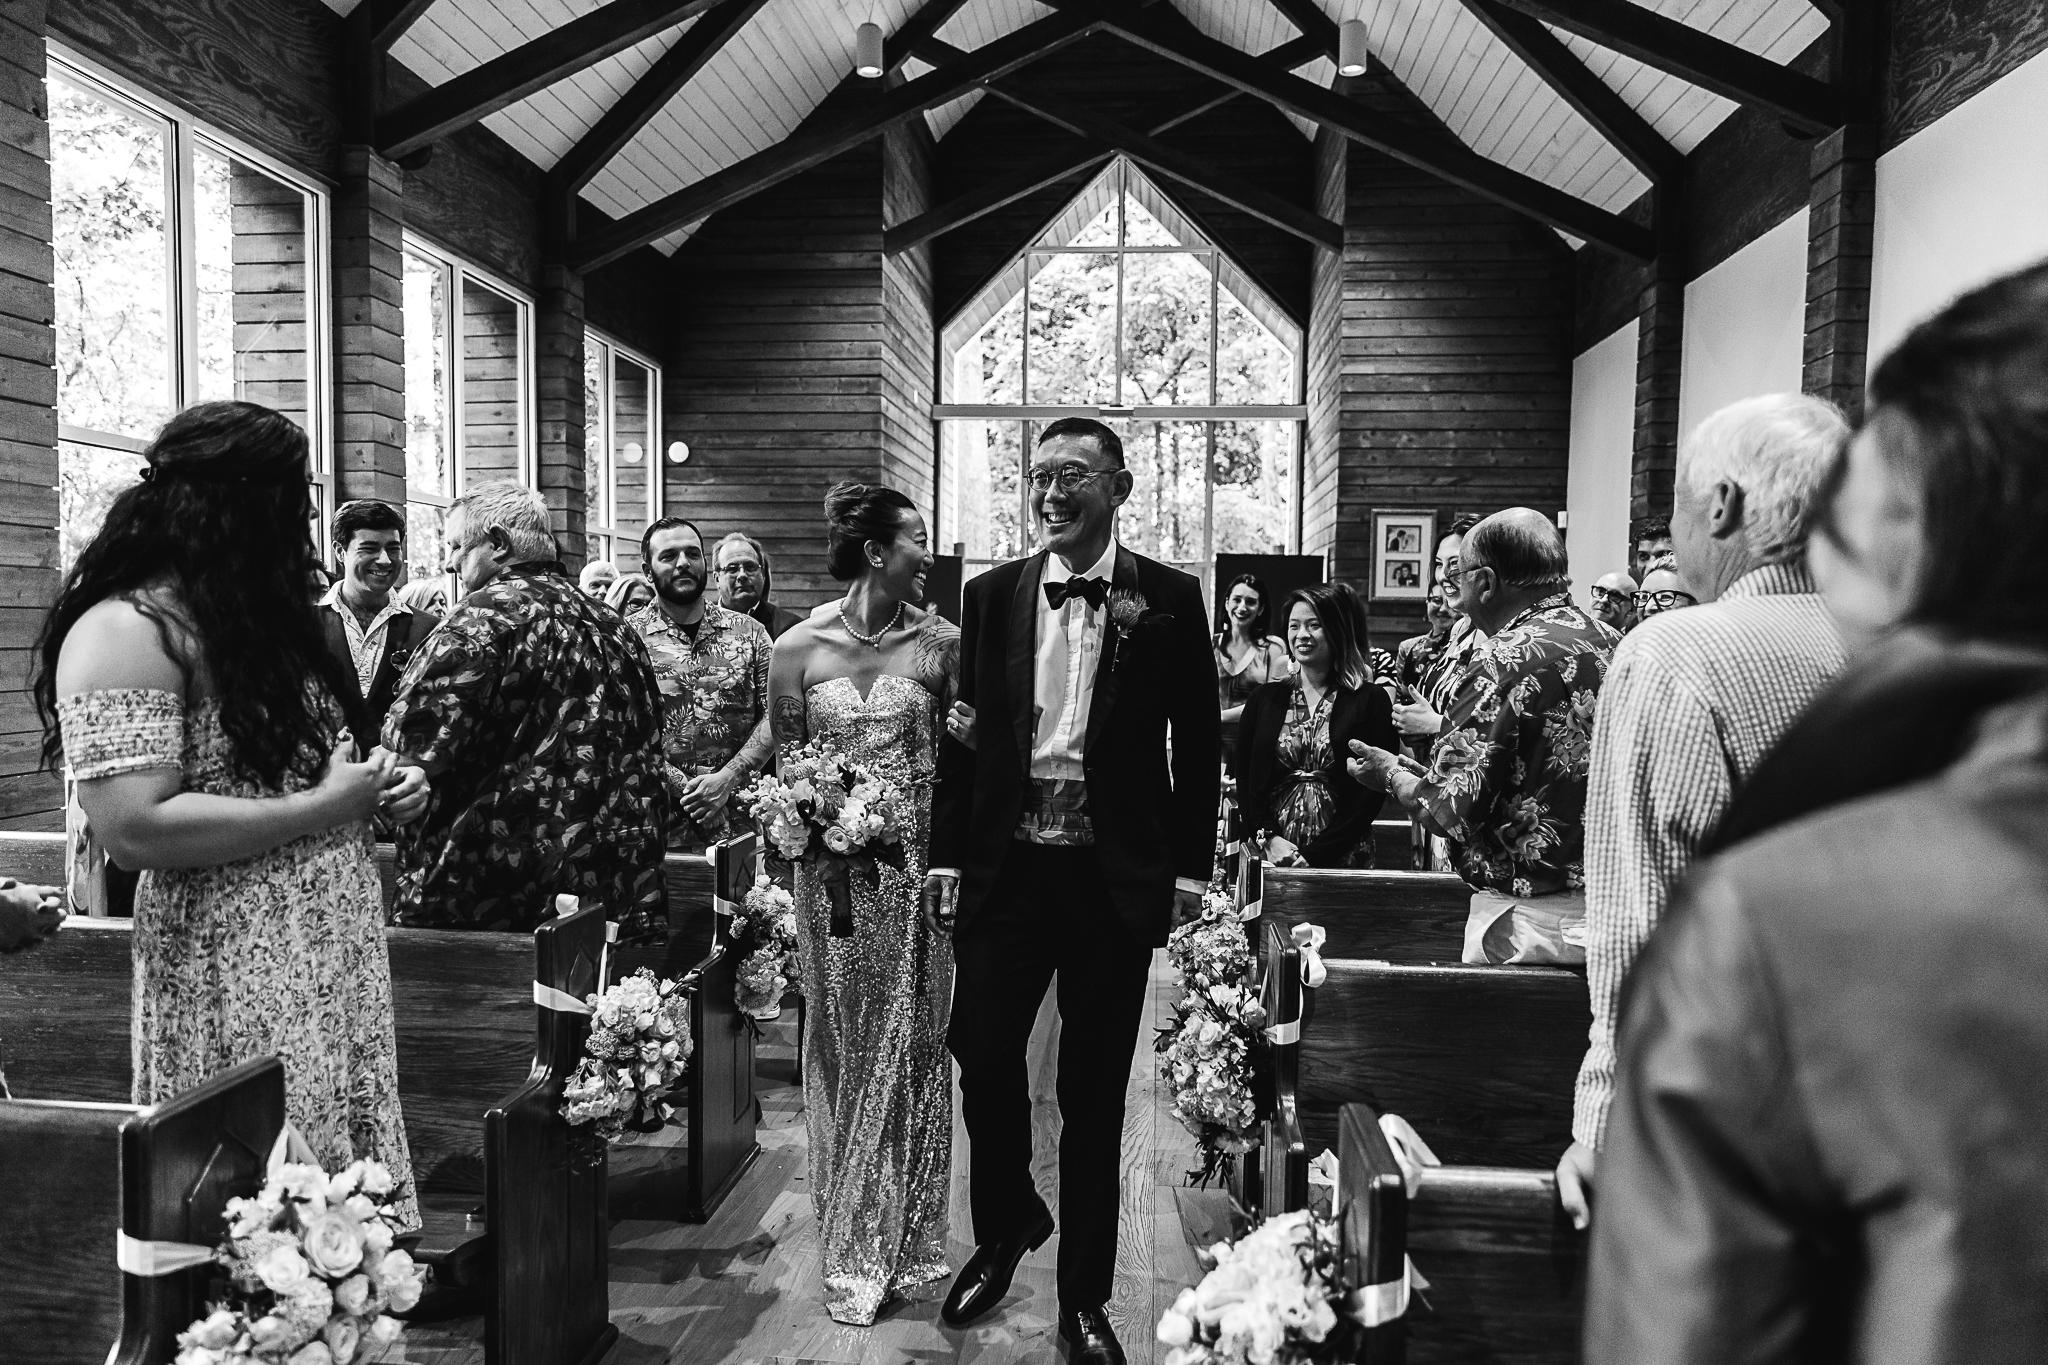 graceland-wedding-memphis-wedding-photographers-beryl-sean-2185-2.jpg